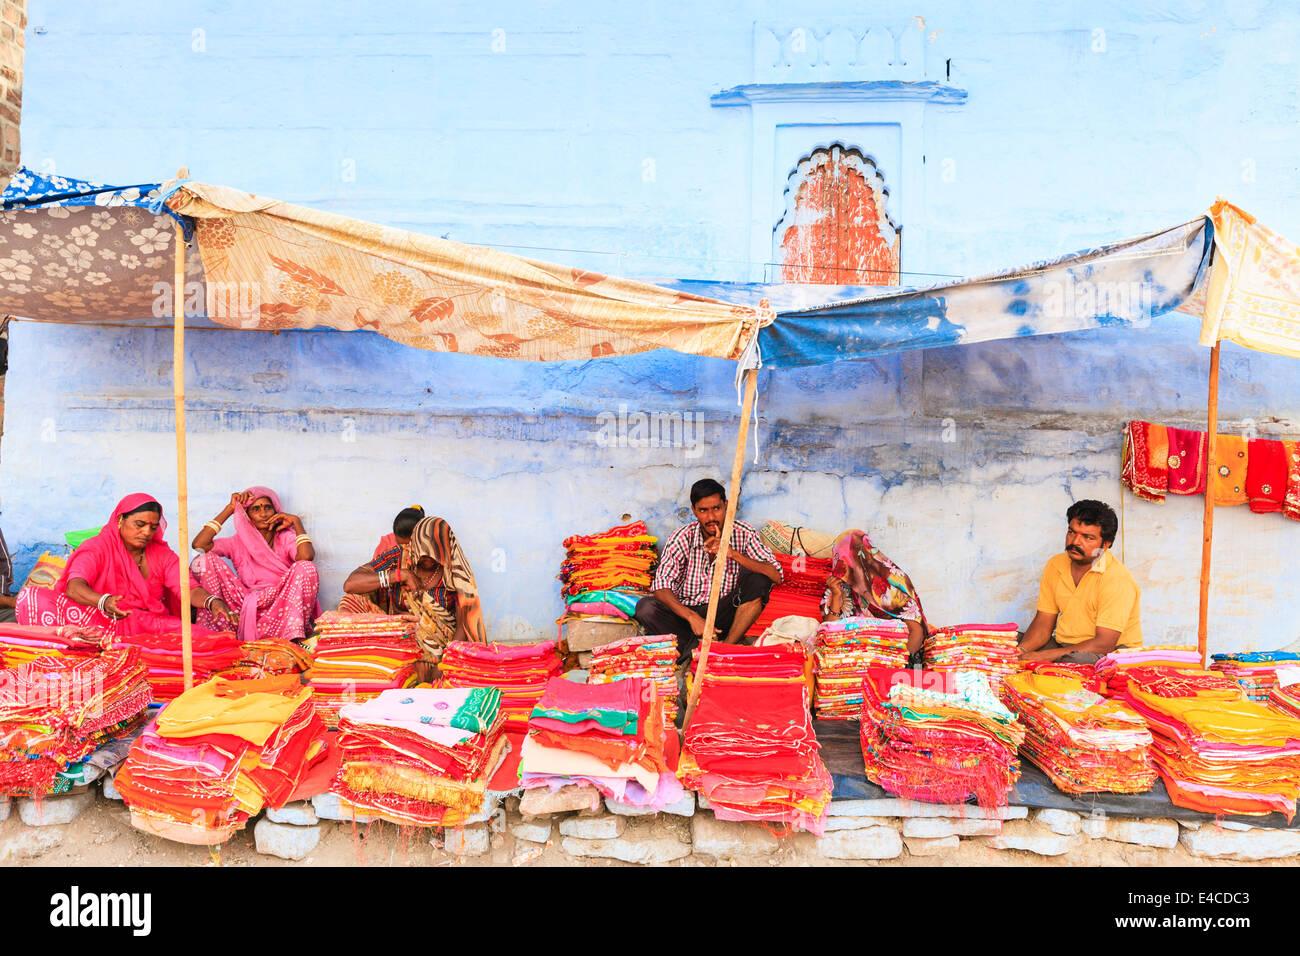 Calado de seda, Jodhpur, Rajasthan, India Imagen De Stock